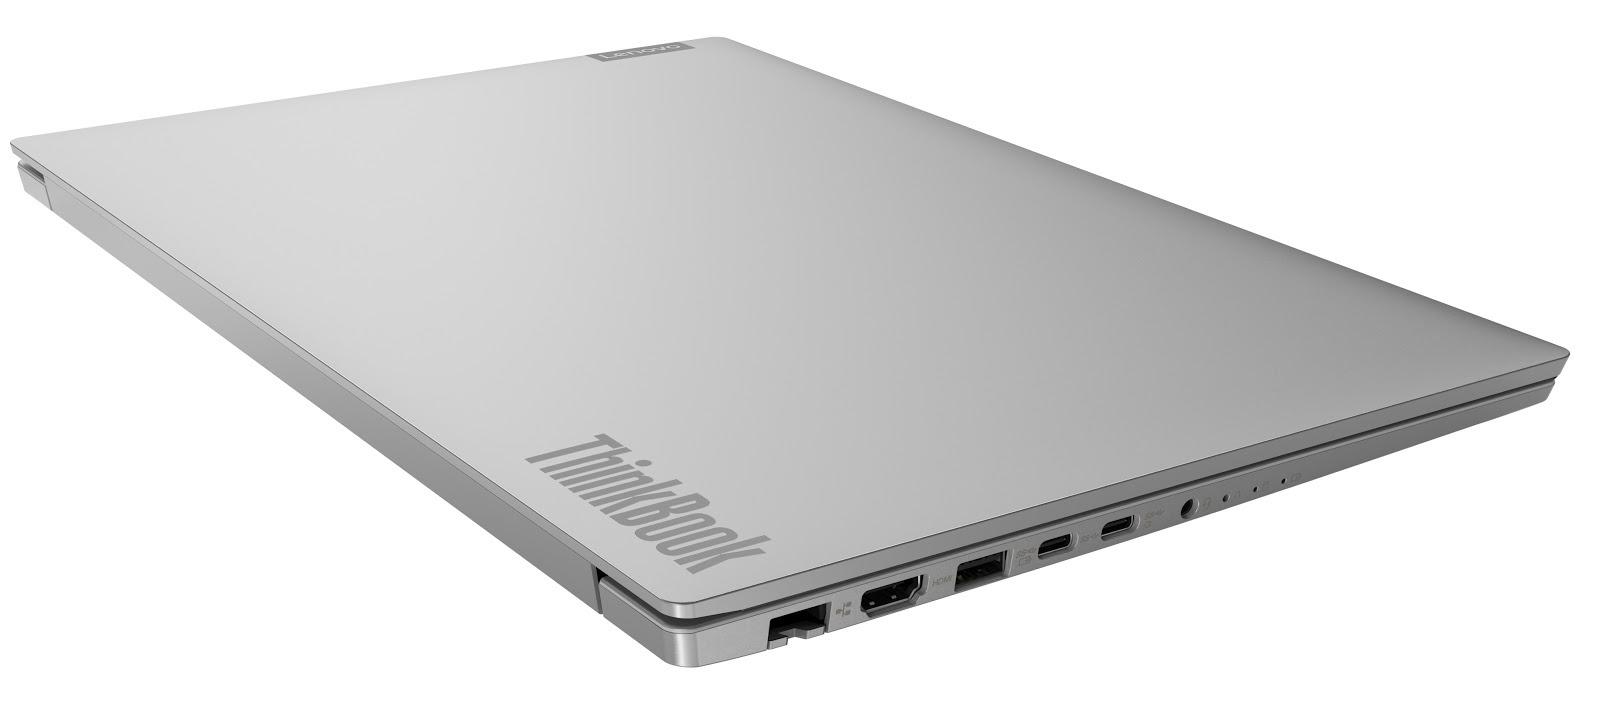 Фото 3. Ноутбук Lenovo ThinkBook 15-IIL (20SM0030RU)